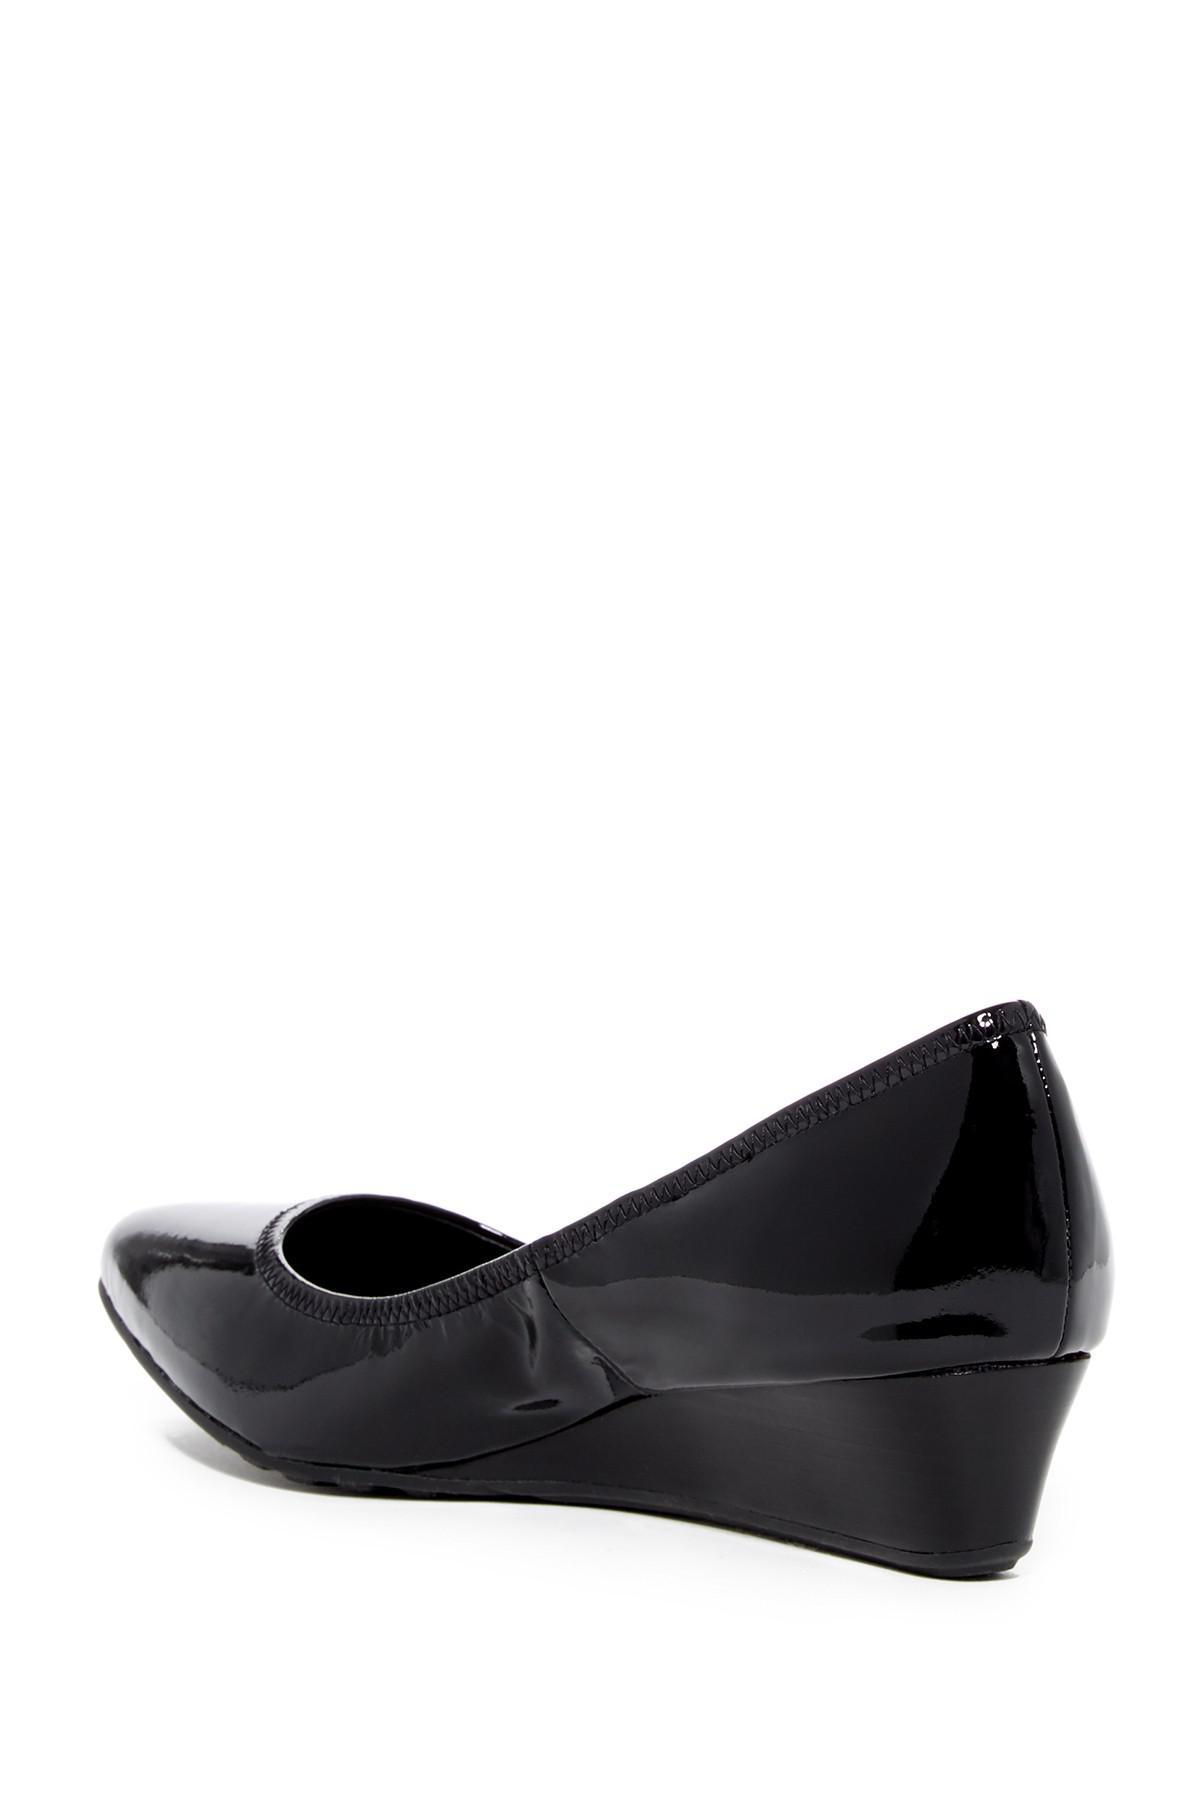 Black Women Shoes Nordstrom Narrow Pumps